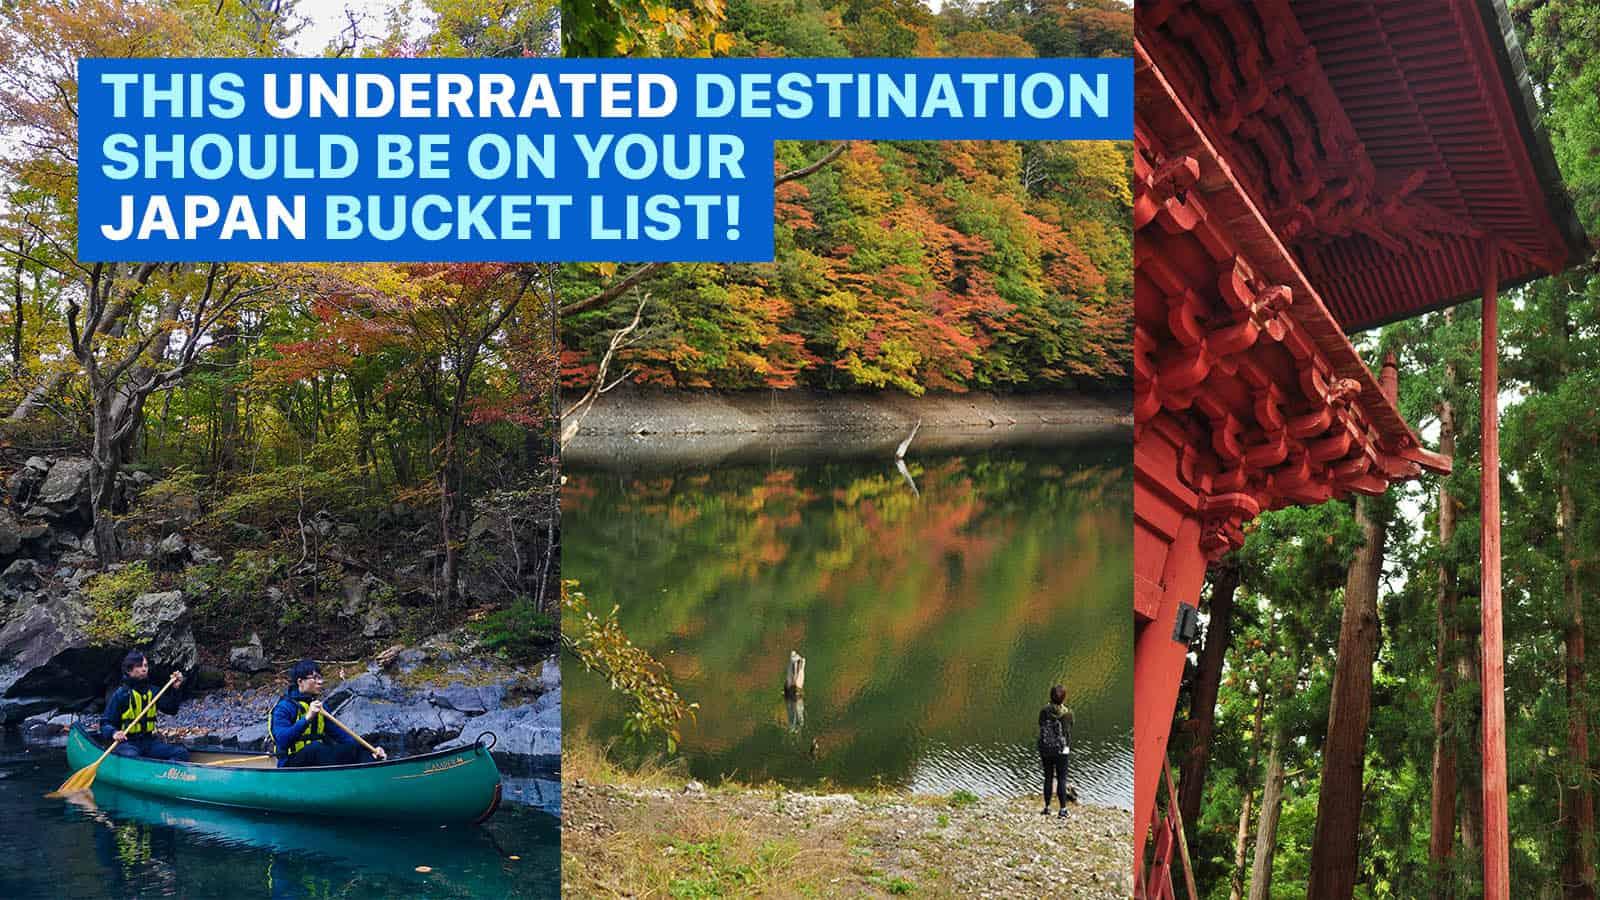 AOMORI & AKITA PREFECTURES: 12 Best Things to Do